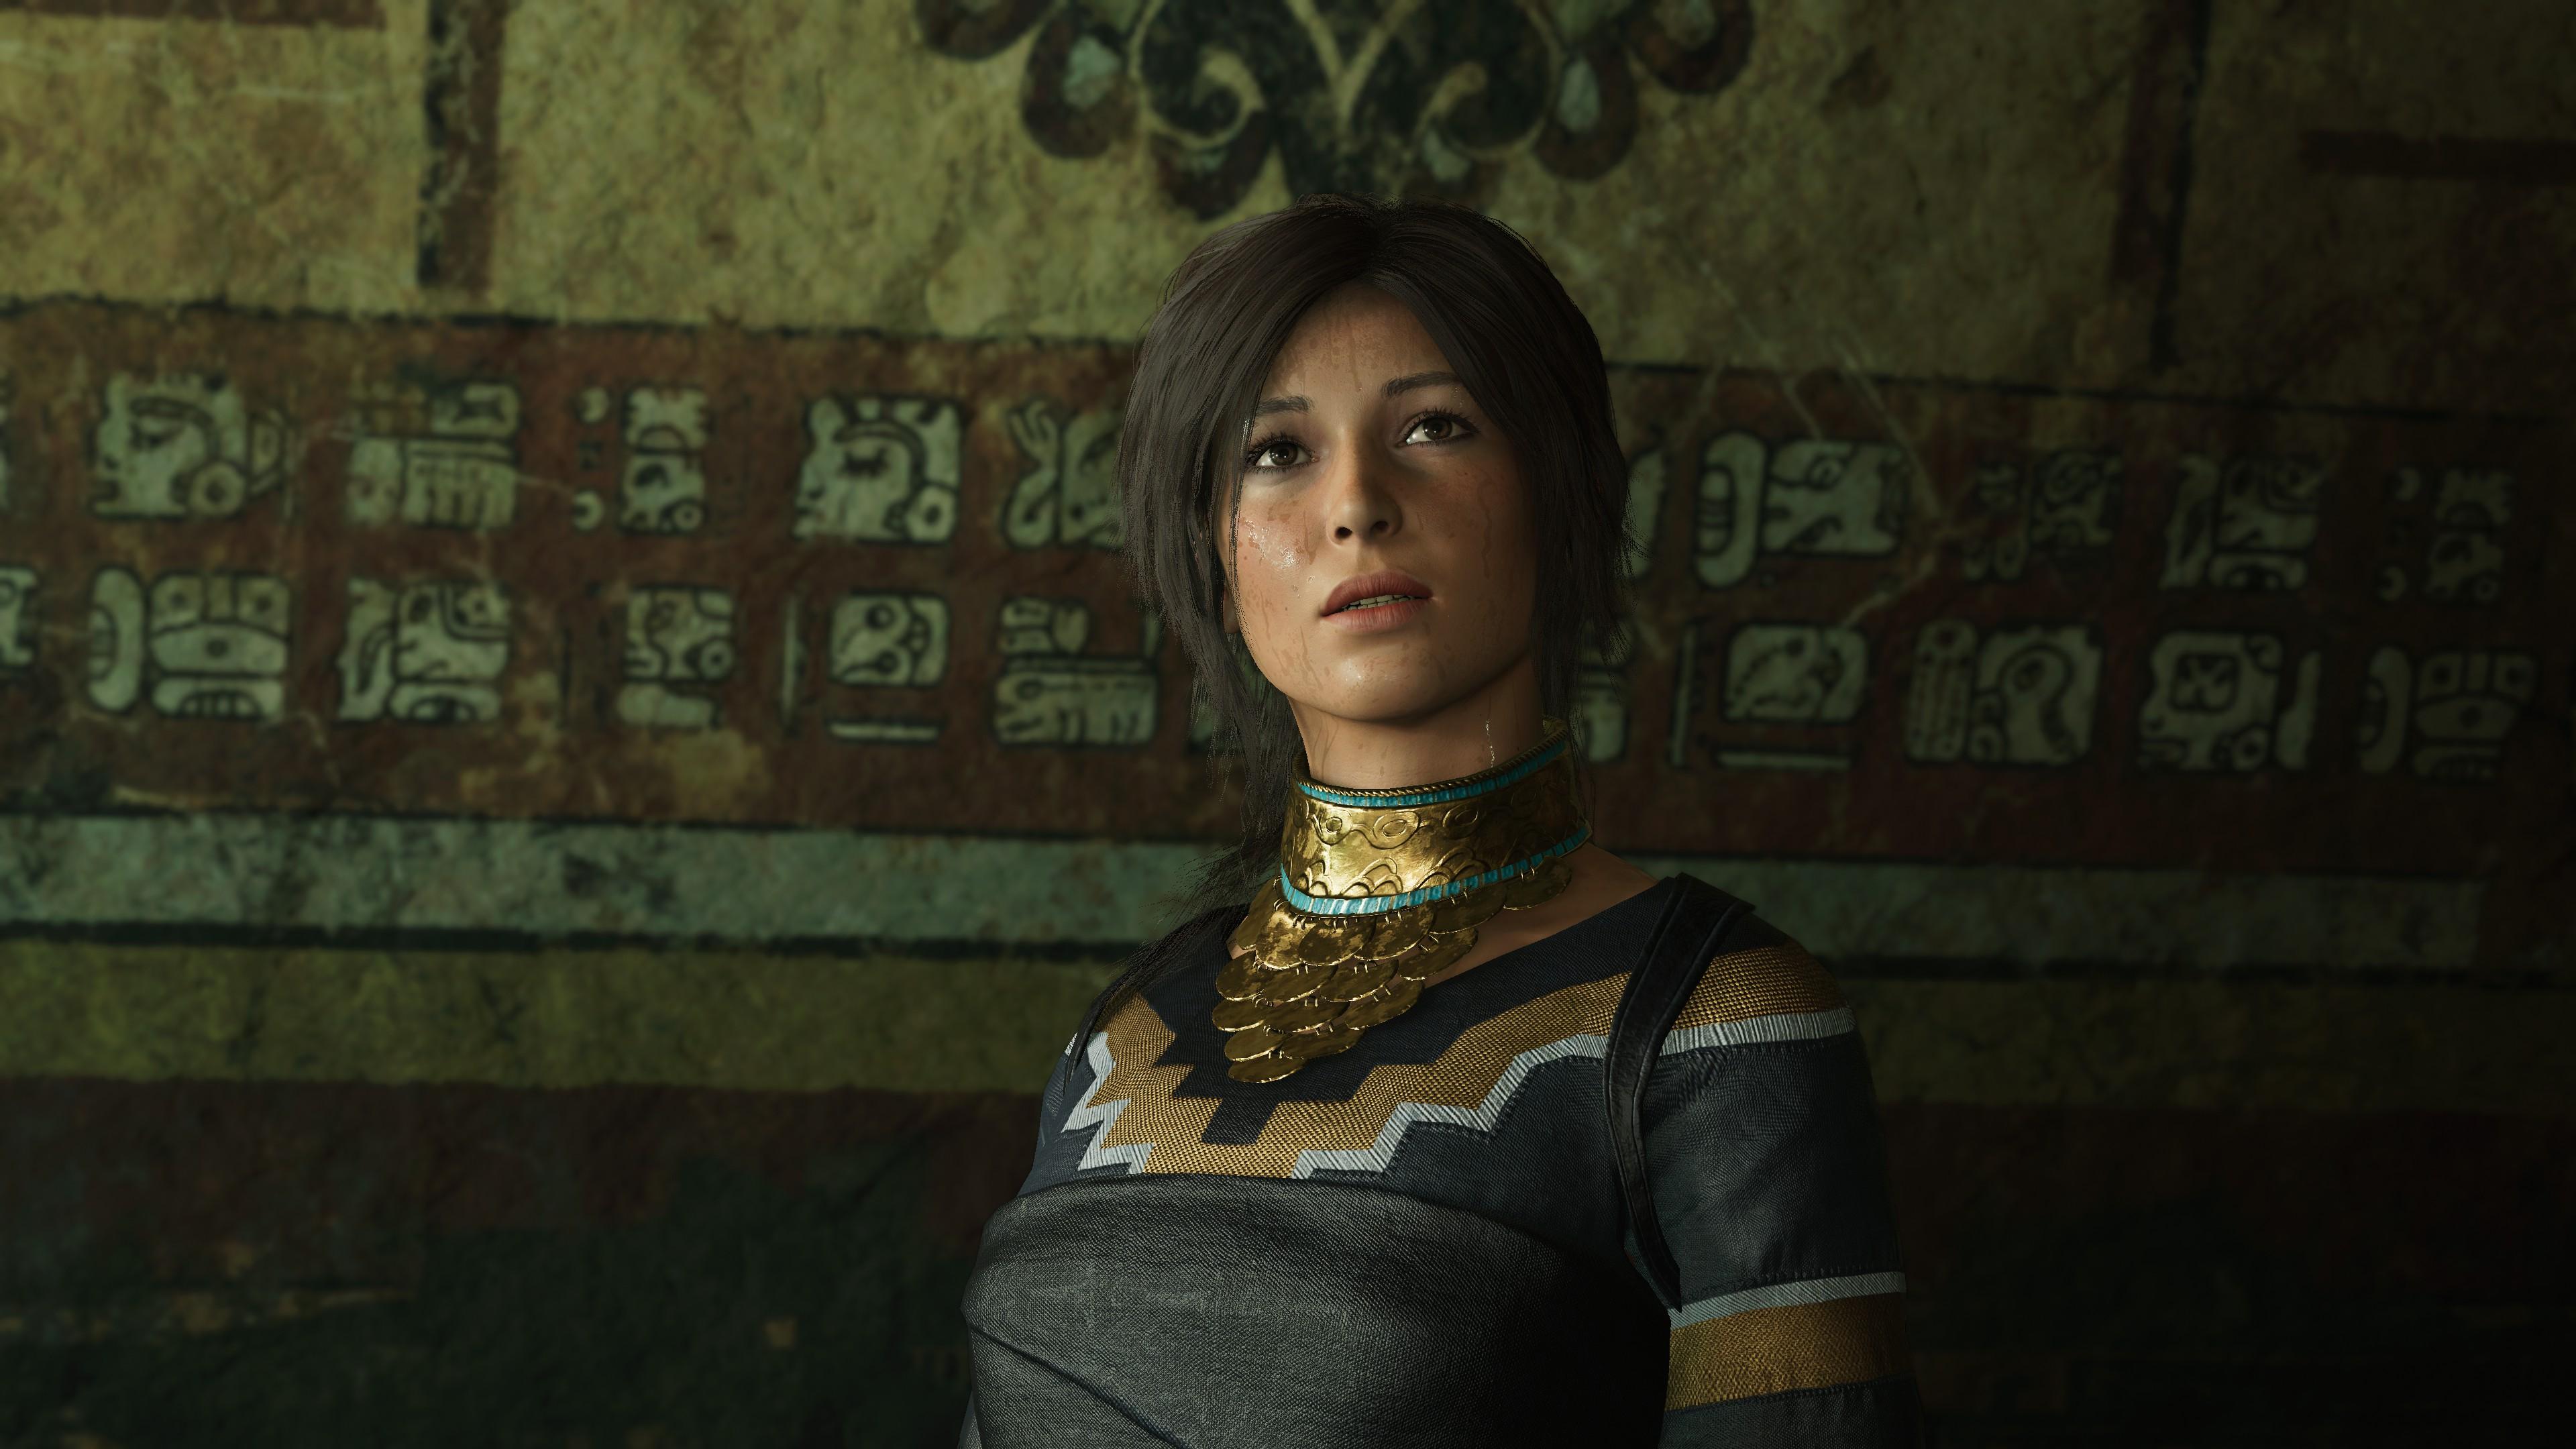 20180917183152_1.jpg - Shadow of the Tomb Raider